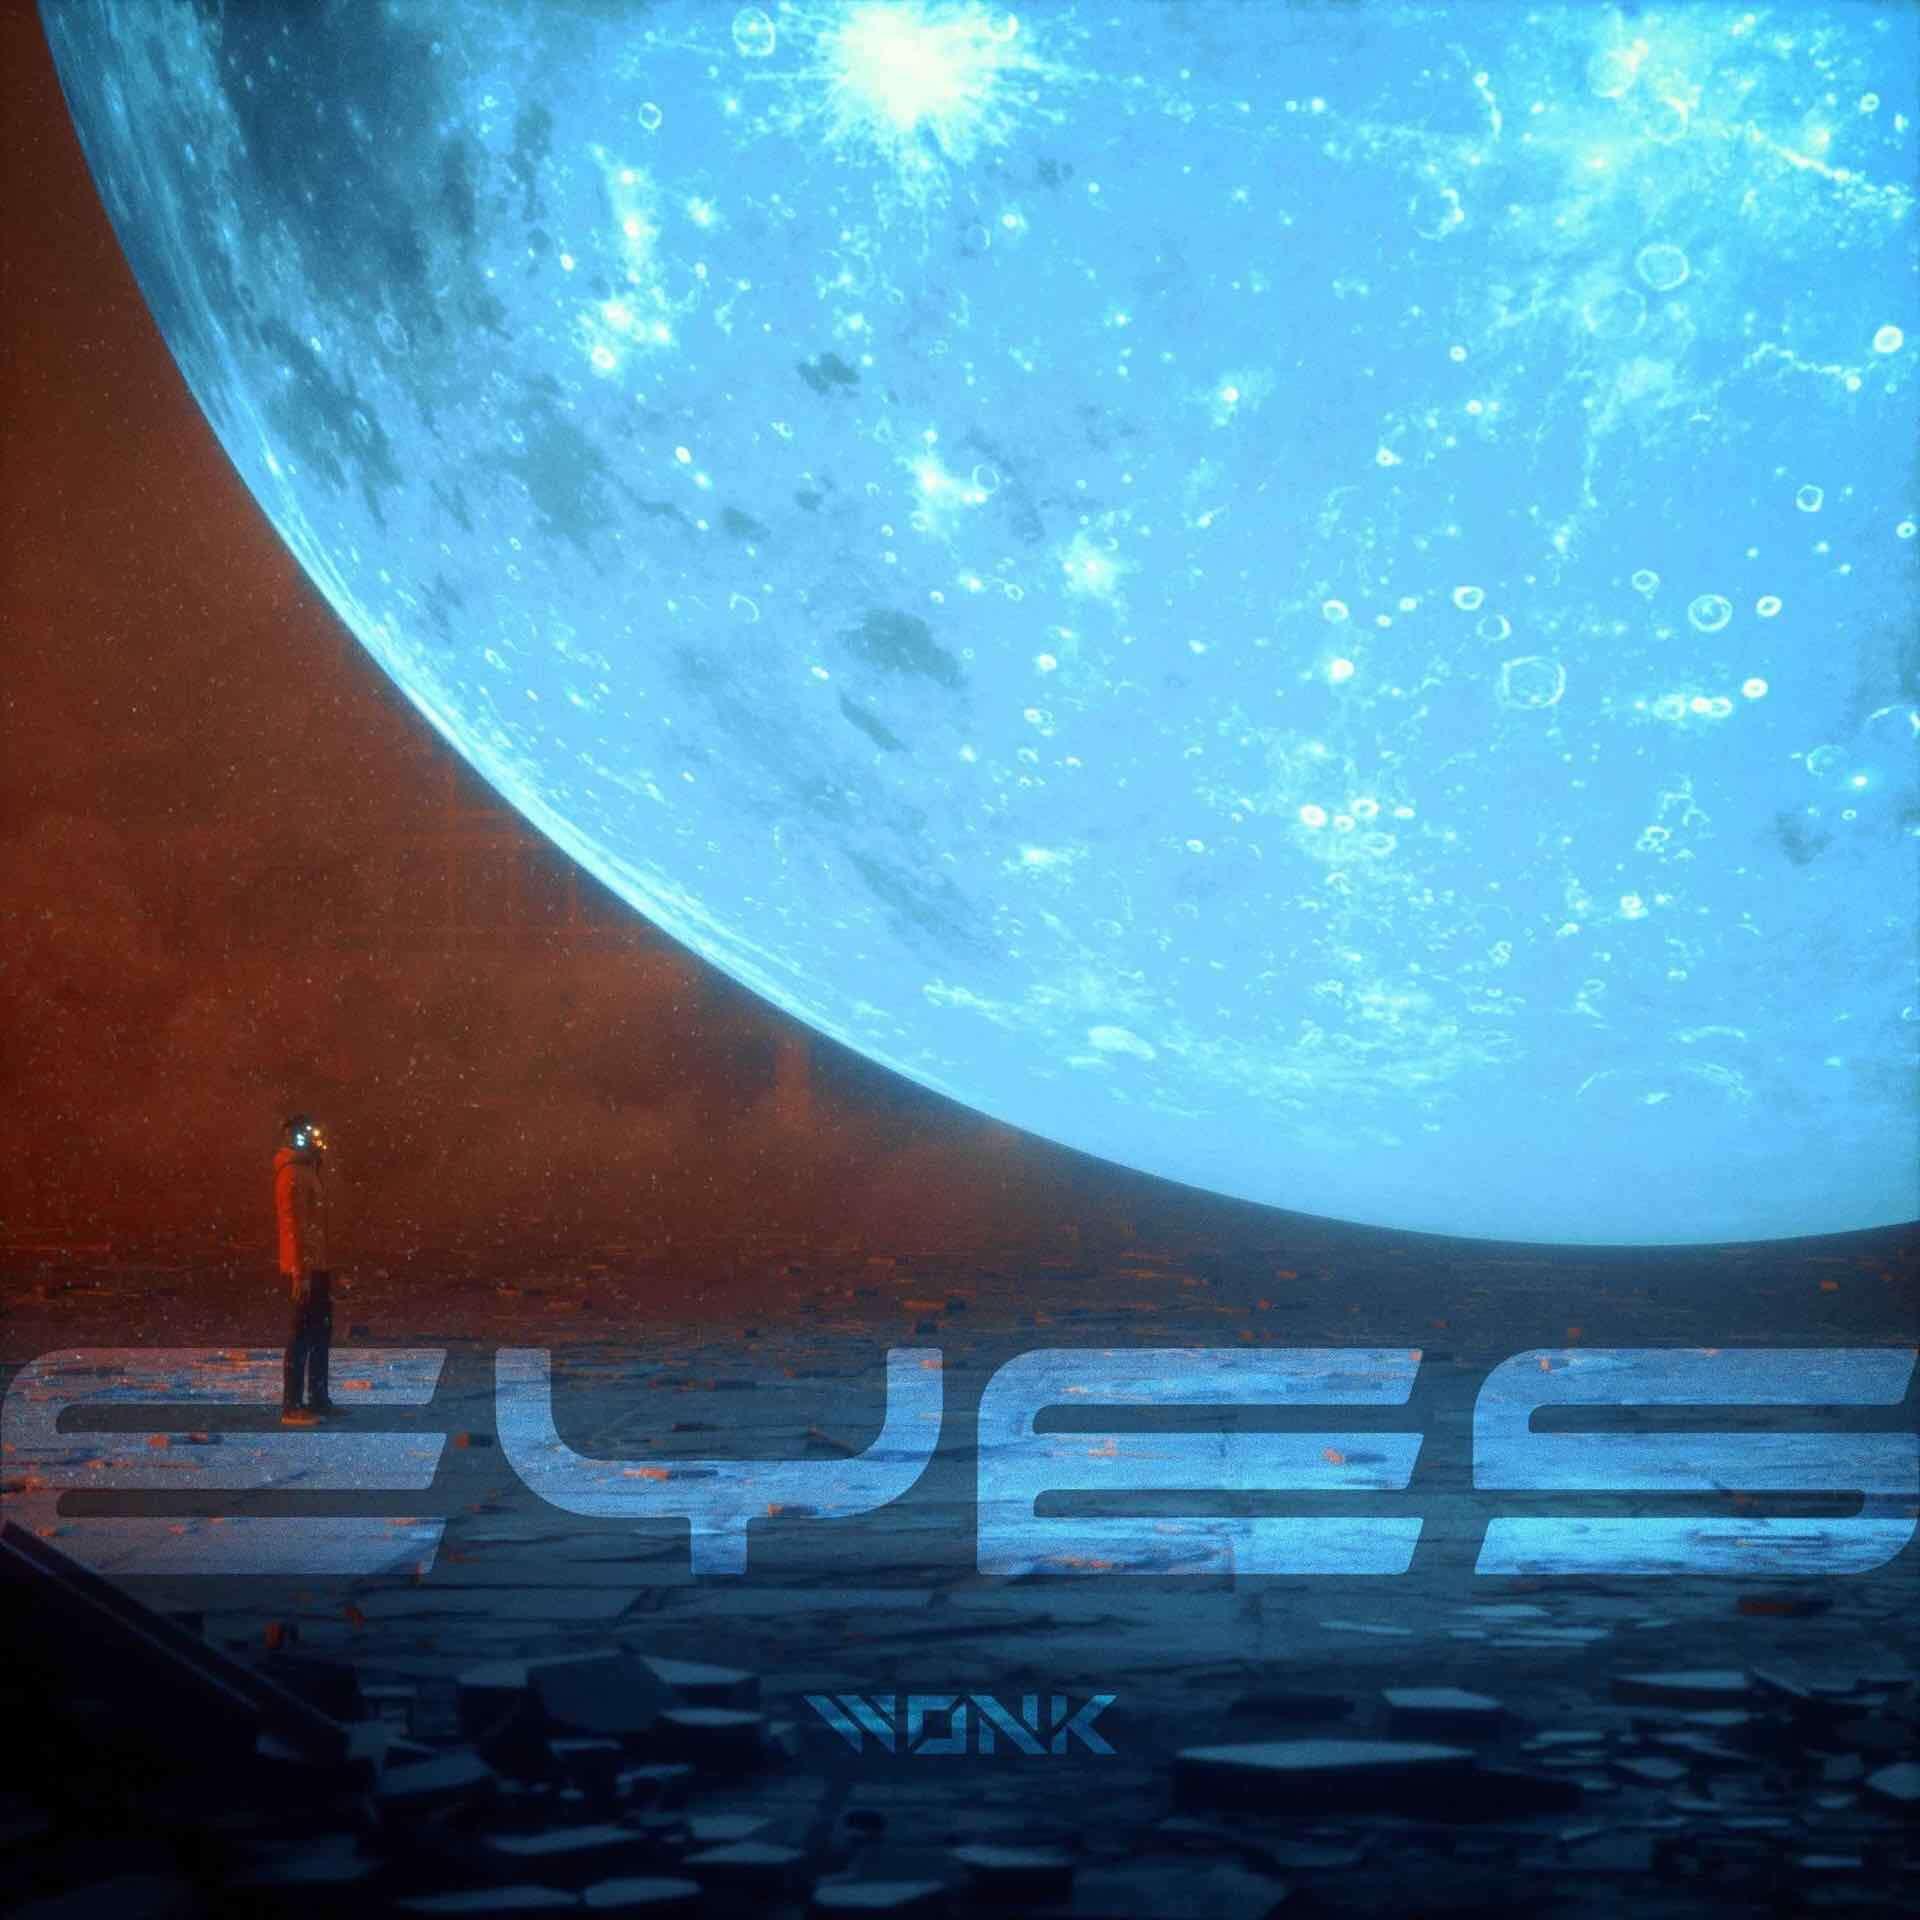 WONK最新作『EYES』の発売記念ライブが仮想空間上で開催決定|InterFM897『WONK RADIO』は今夜限定で復活 music200617_wonk_2-1920x1920